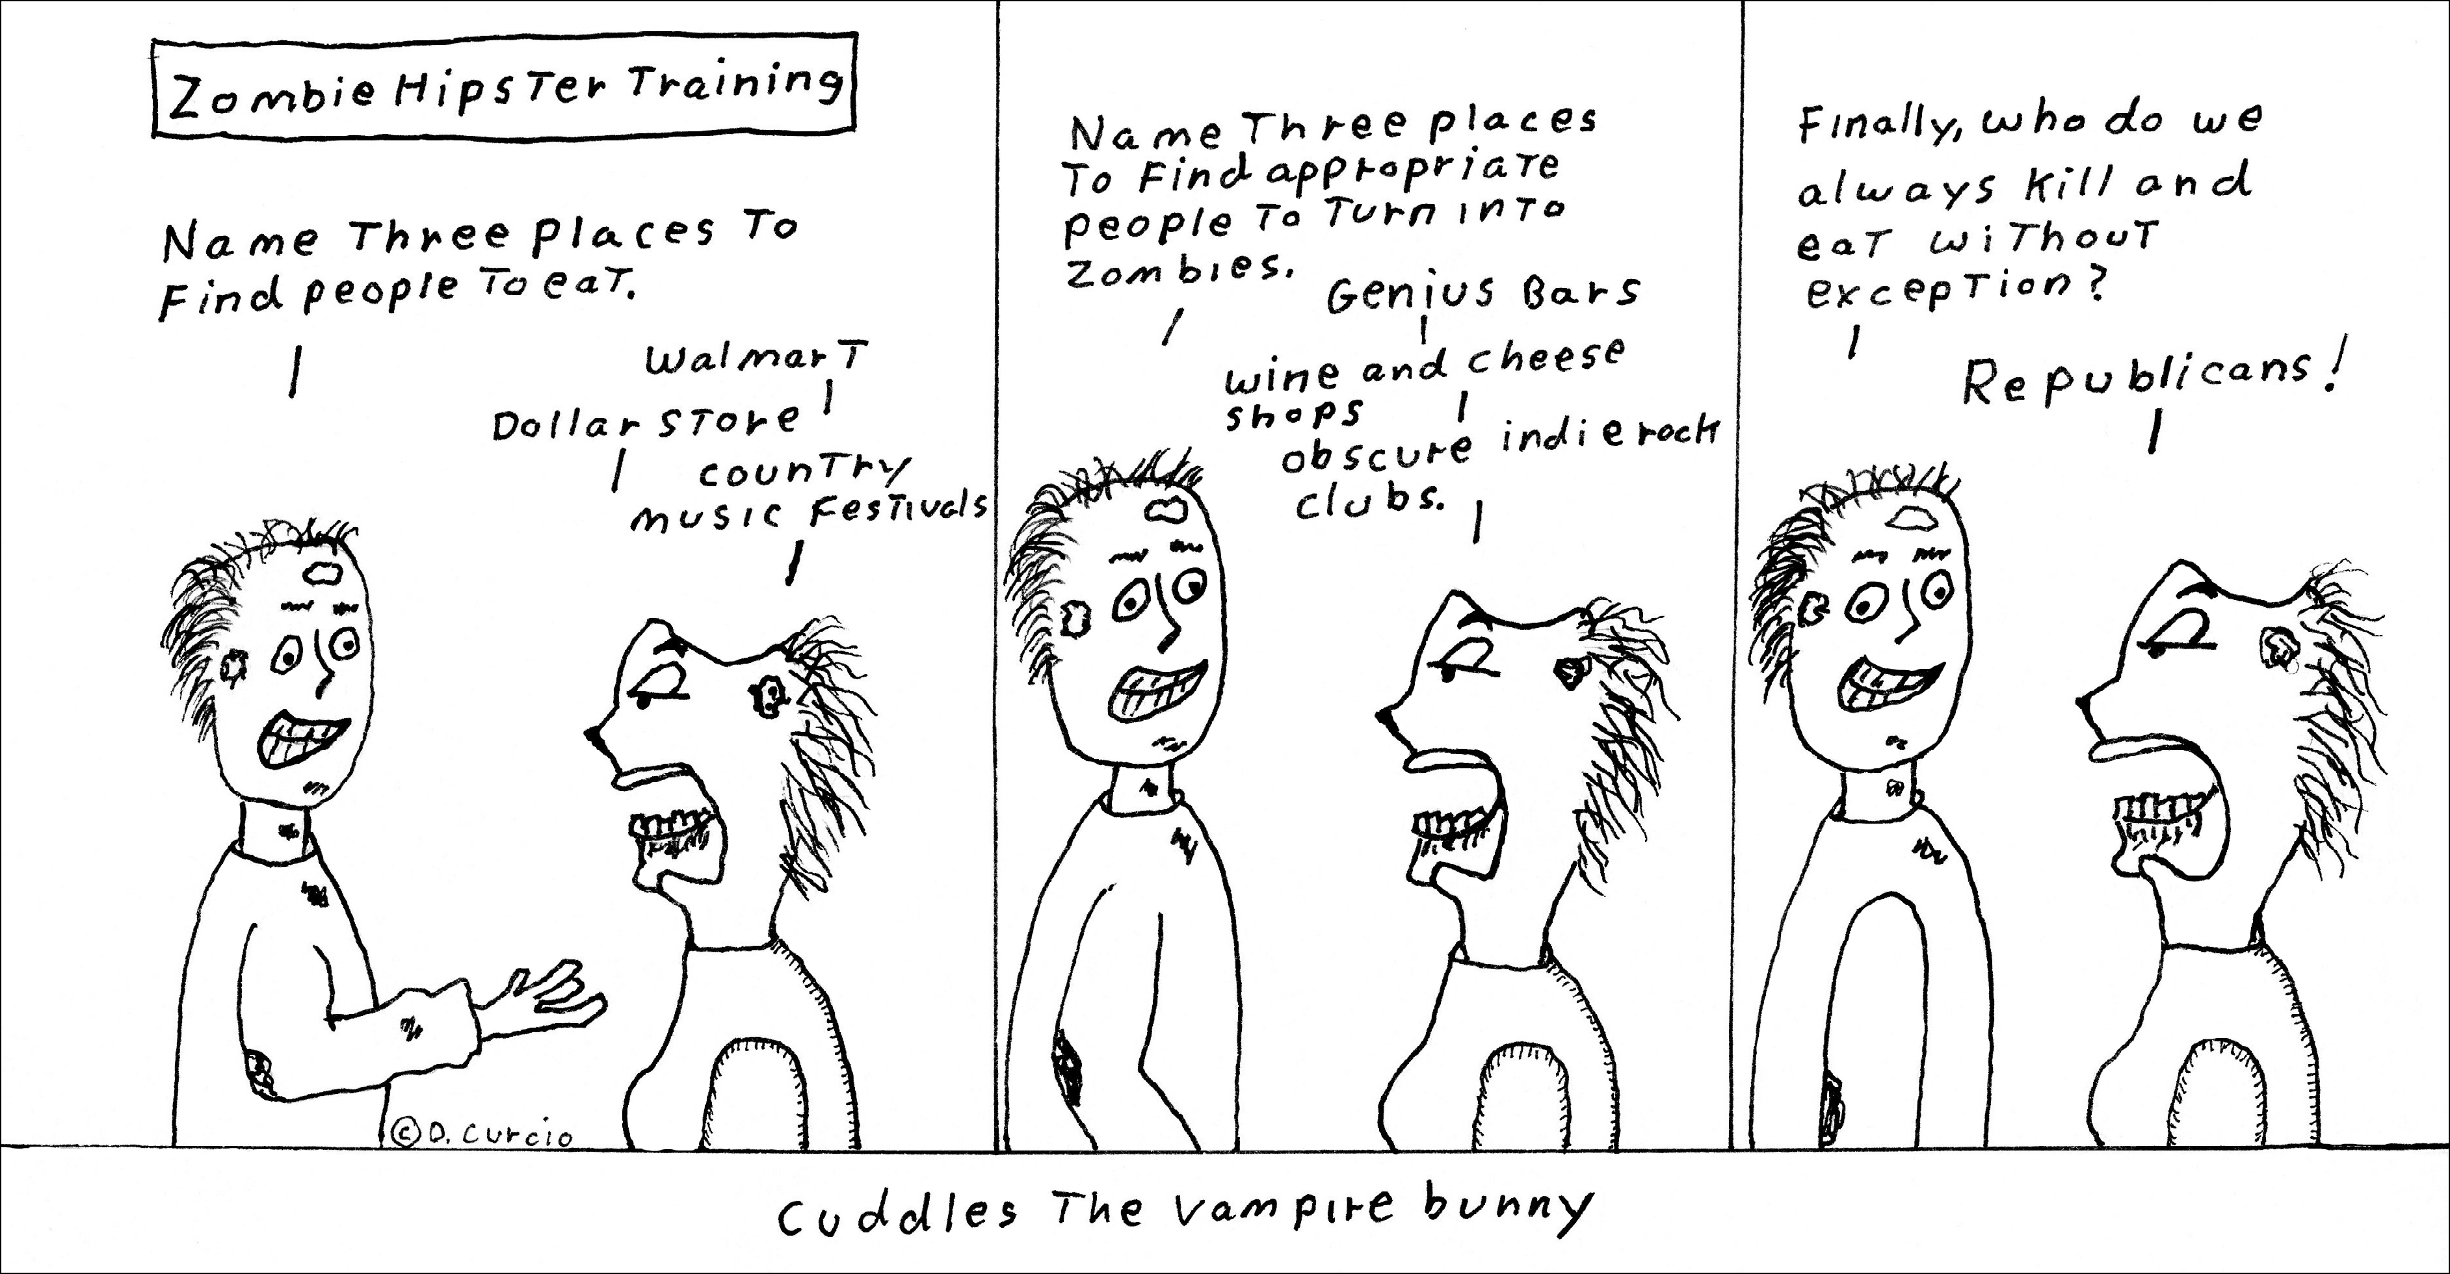 Zombi Hipster Training